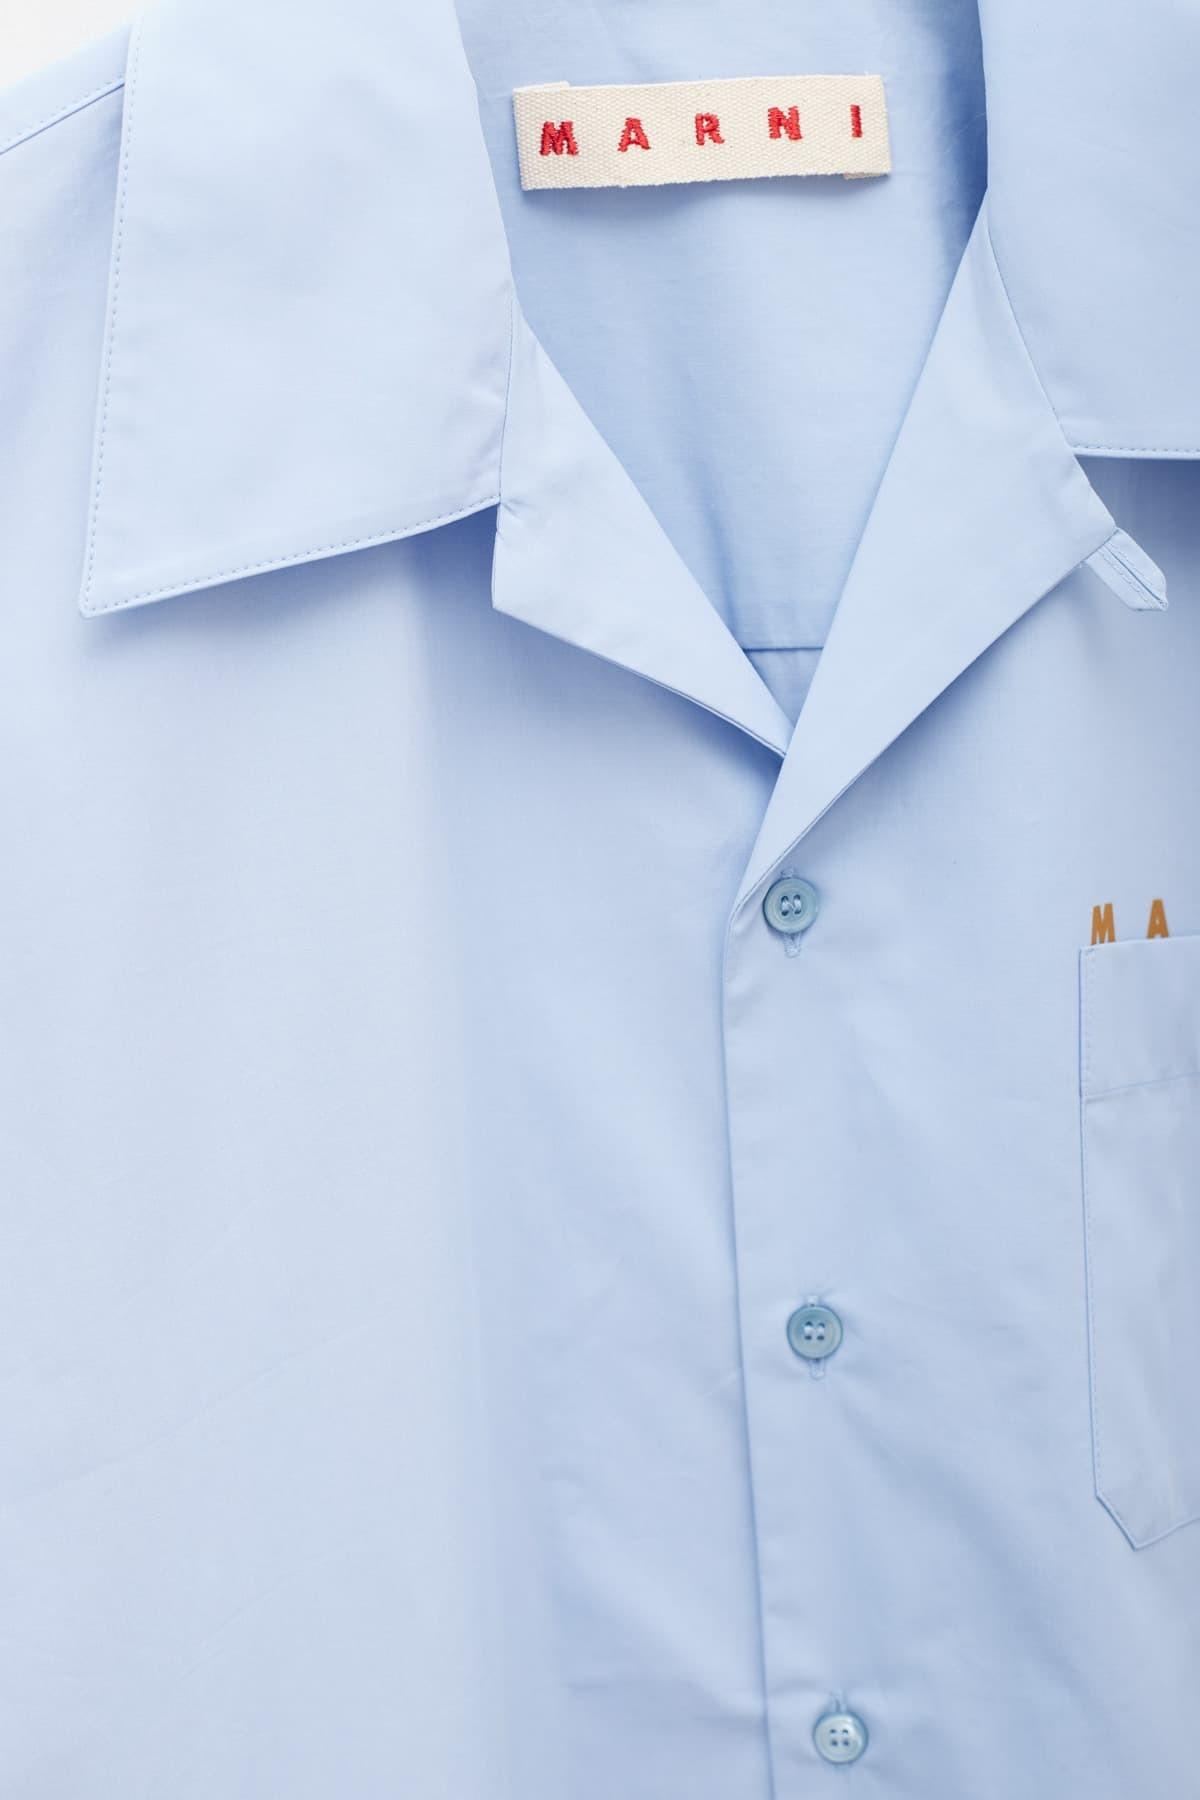 Comprar Acne Studios Beige Shiny Tote BAGS000065 Bag